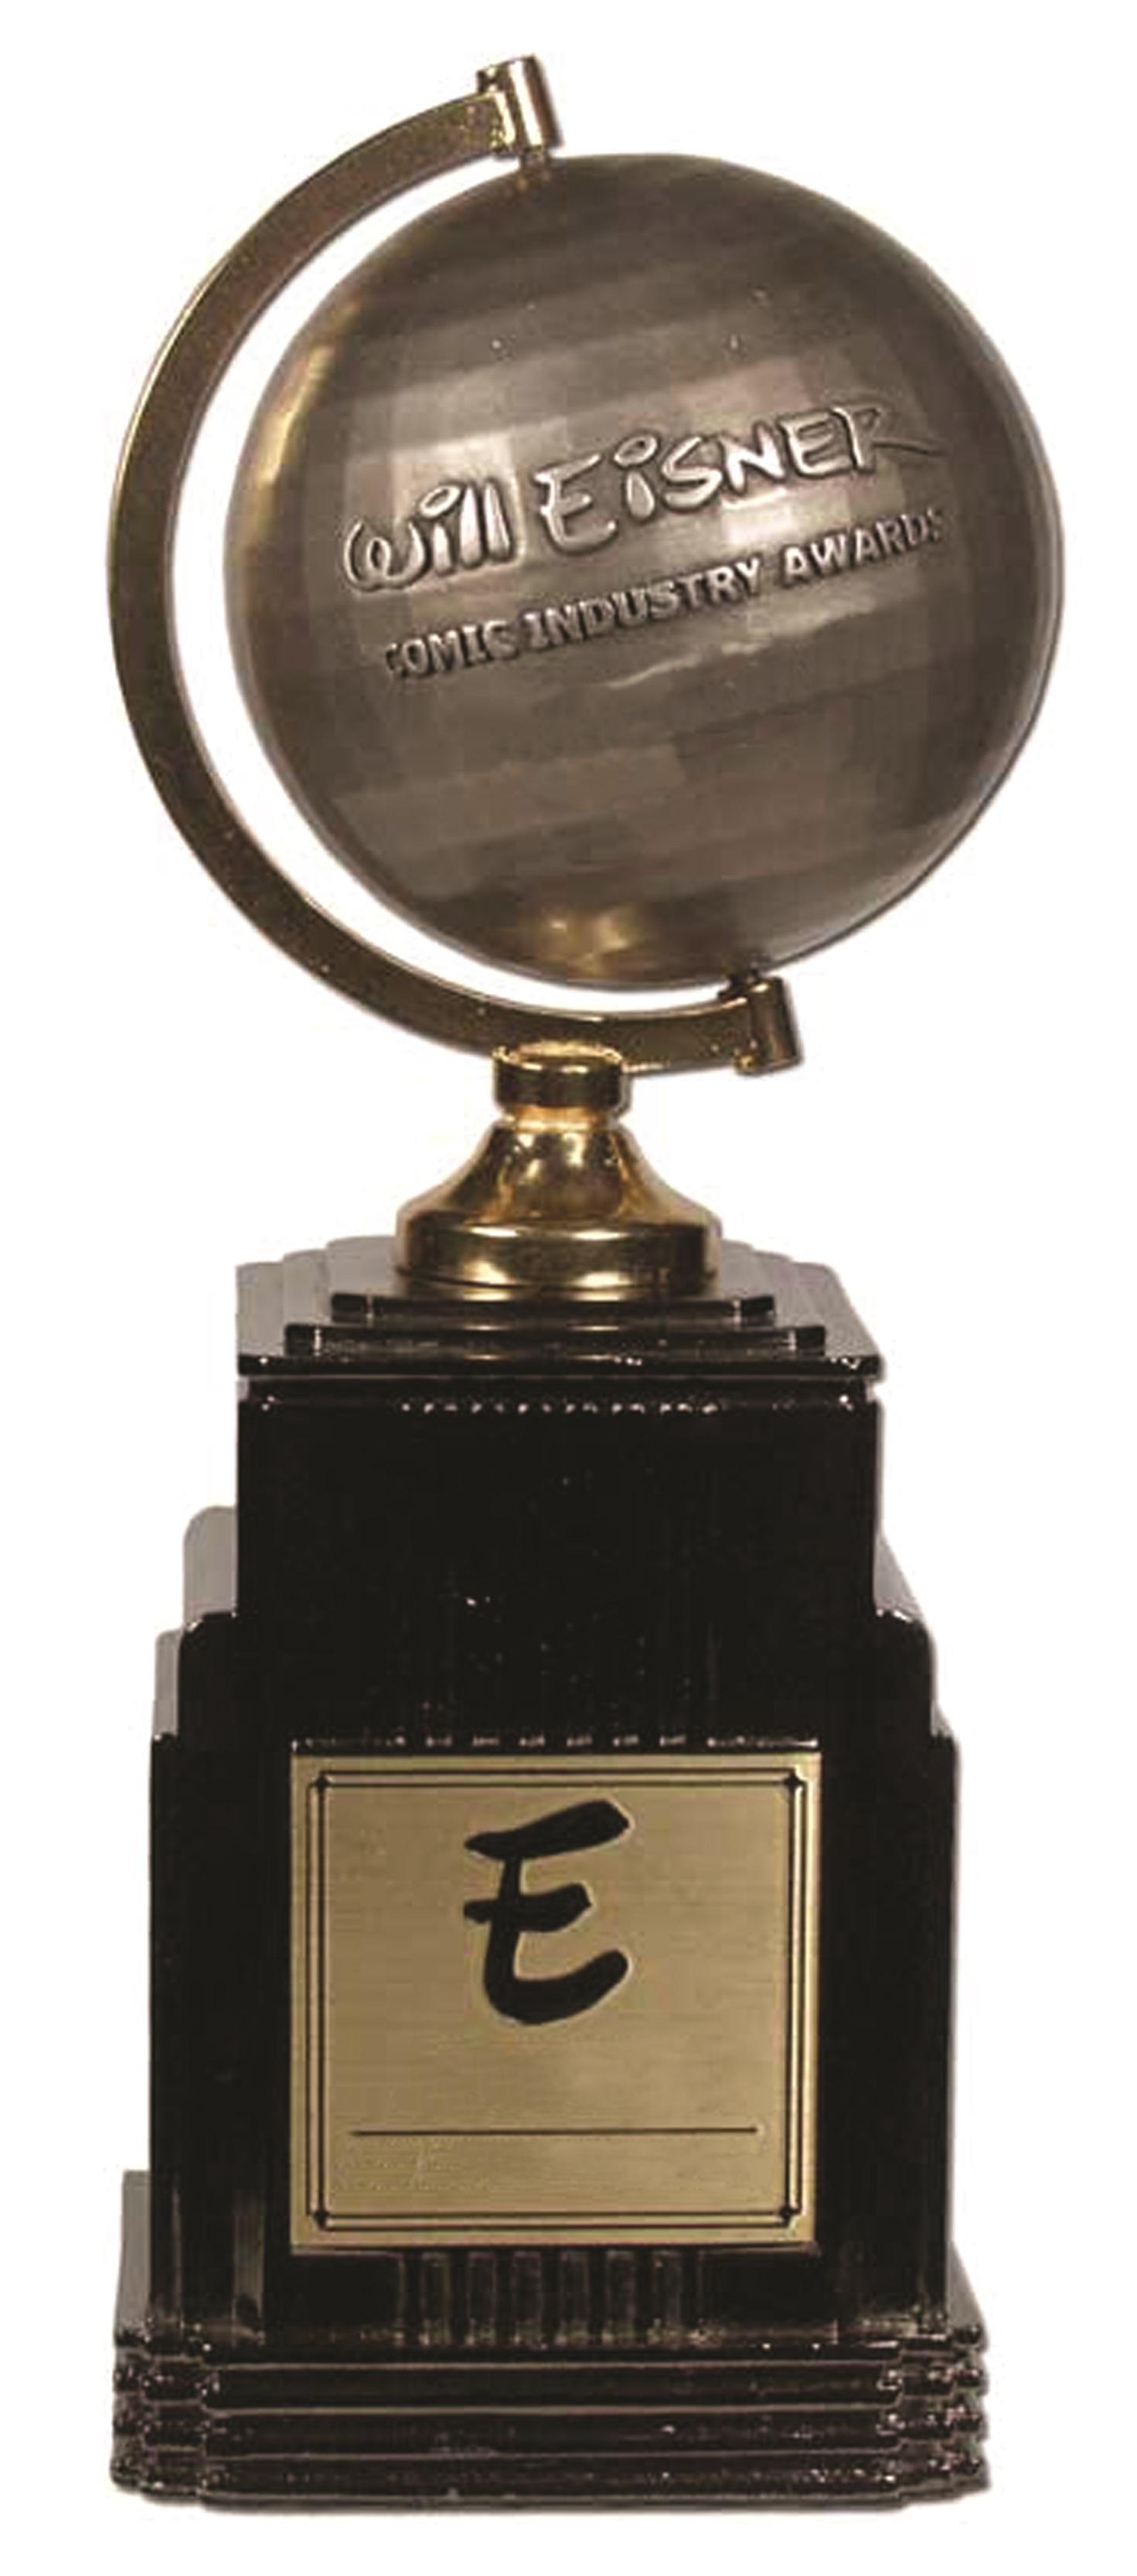 Http Www Willeisner Com The Eisnershpritz Eisner Awards